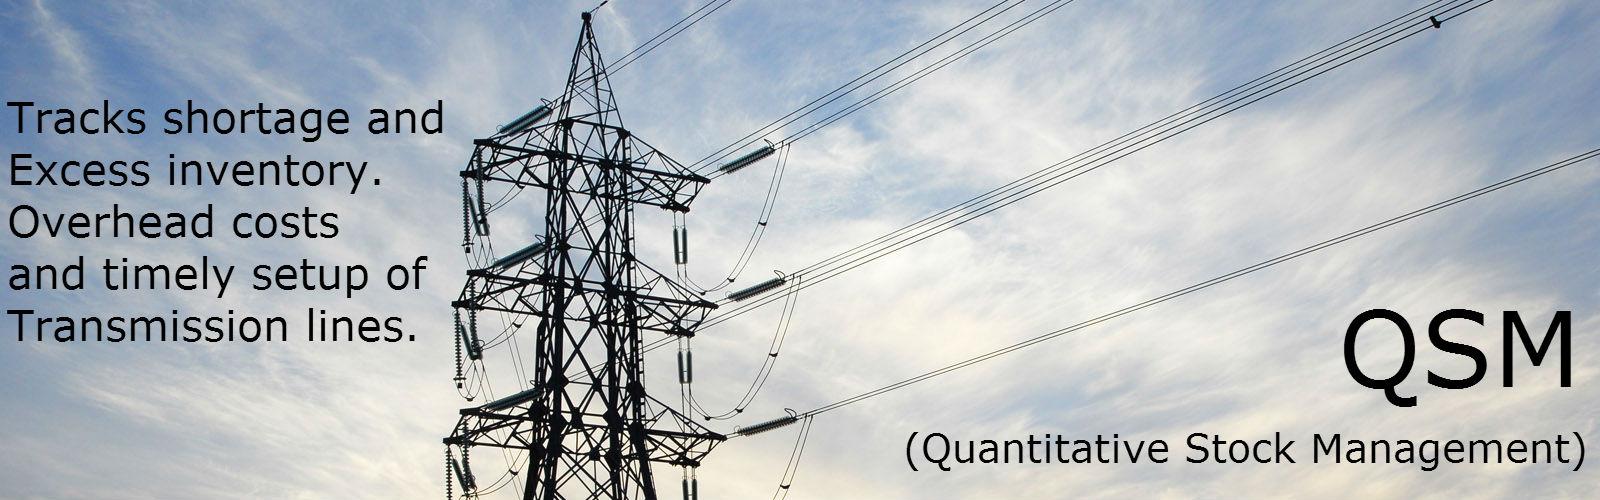 QSM (Quantitative Stock Management)